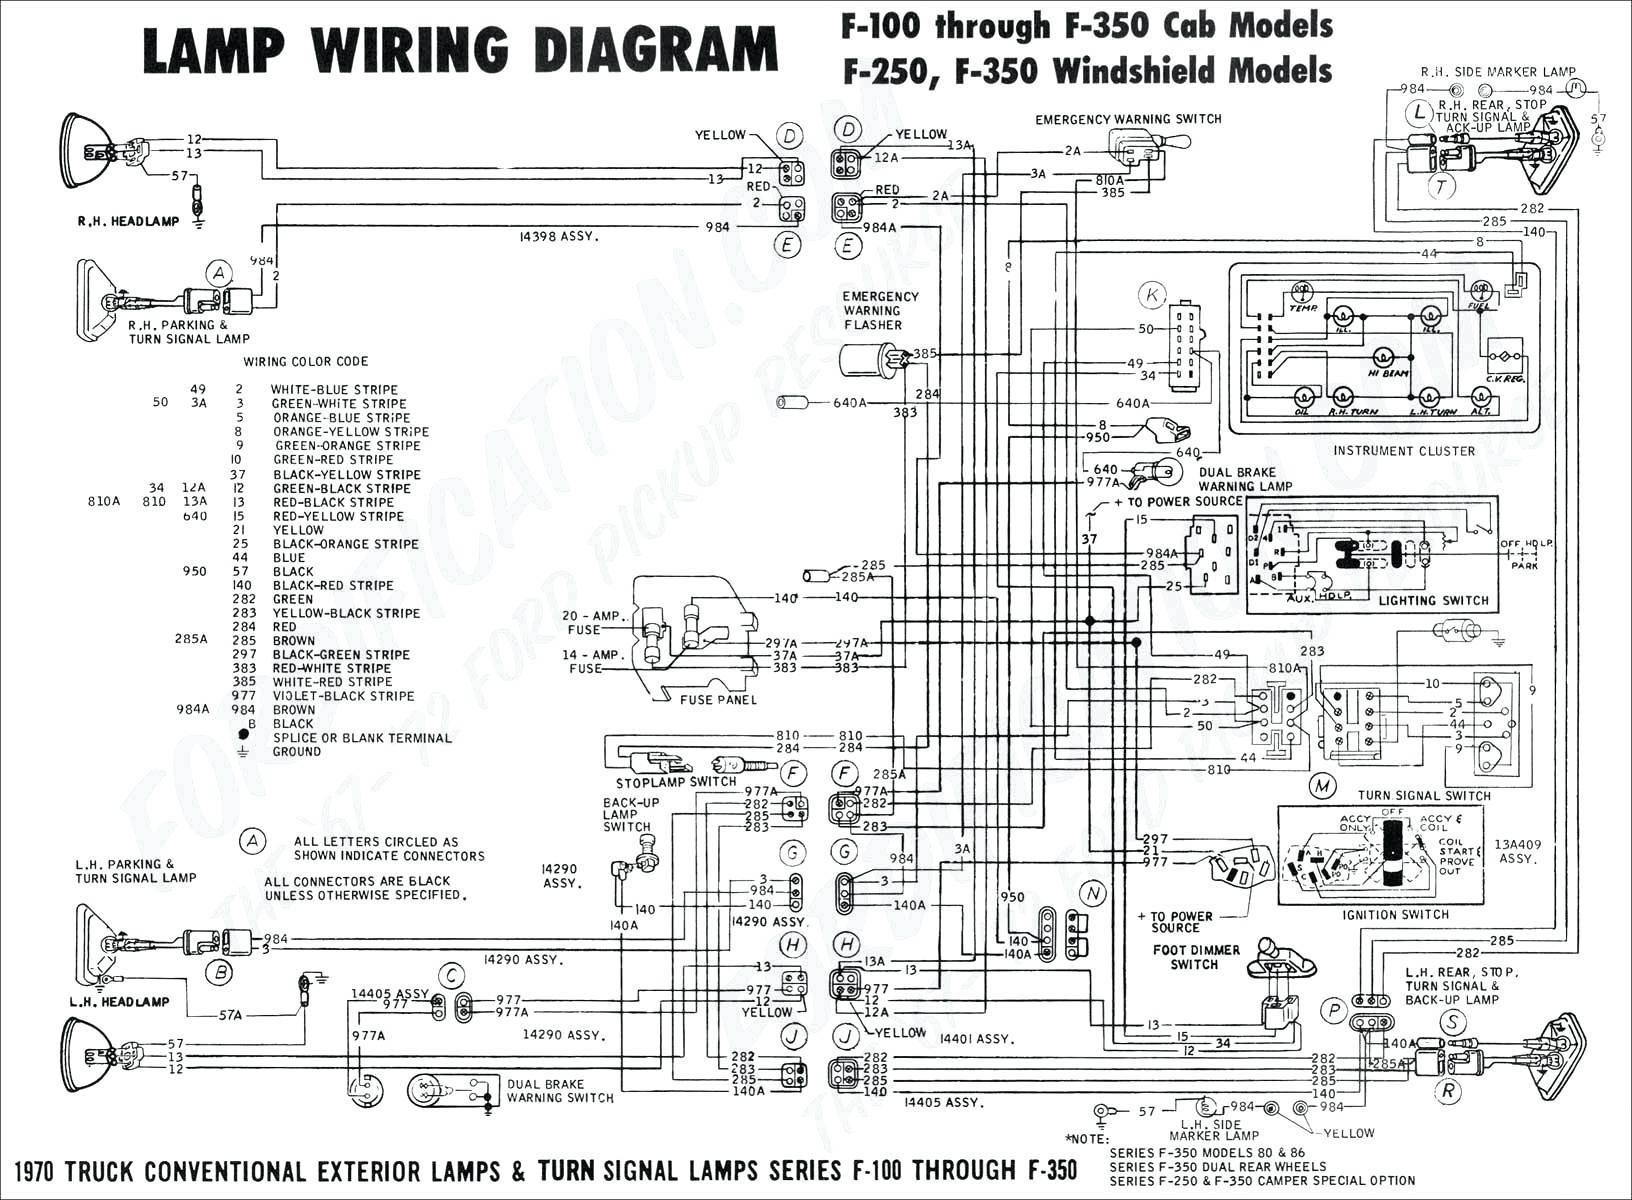 Electric Motor Parts Diagram Electric Motor Control Circuit Diagrams Motor Repalcement Parts and Of Electric Motor Parts Diagram